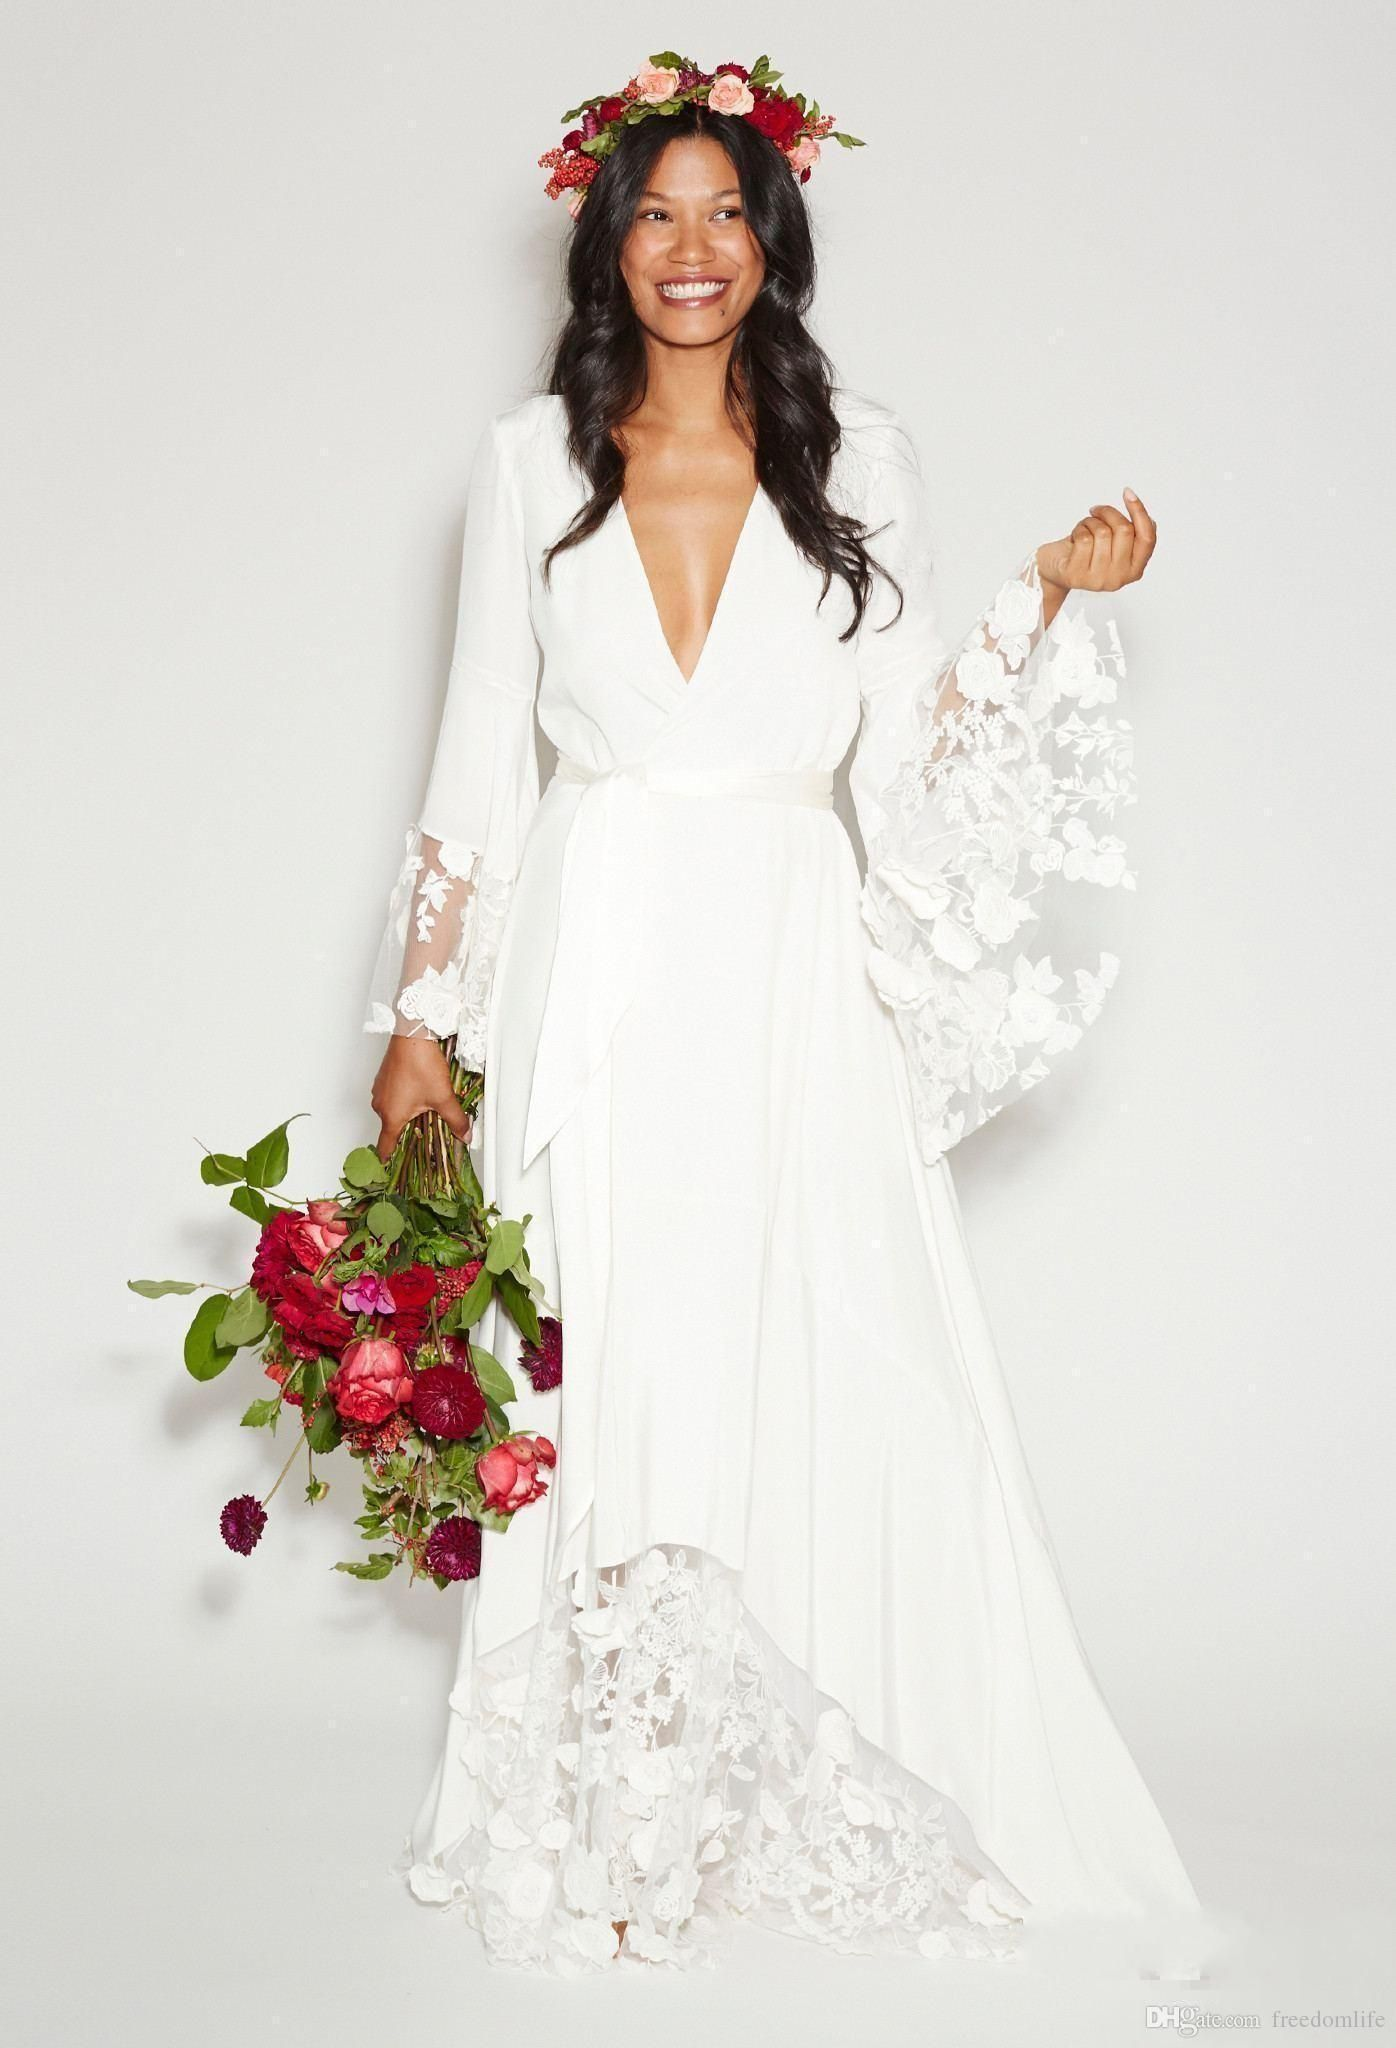 Lace dress bell sleeves june 2019  Boho Beach Wedding Dresses Bohemian Long Bell Sleeve Lace